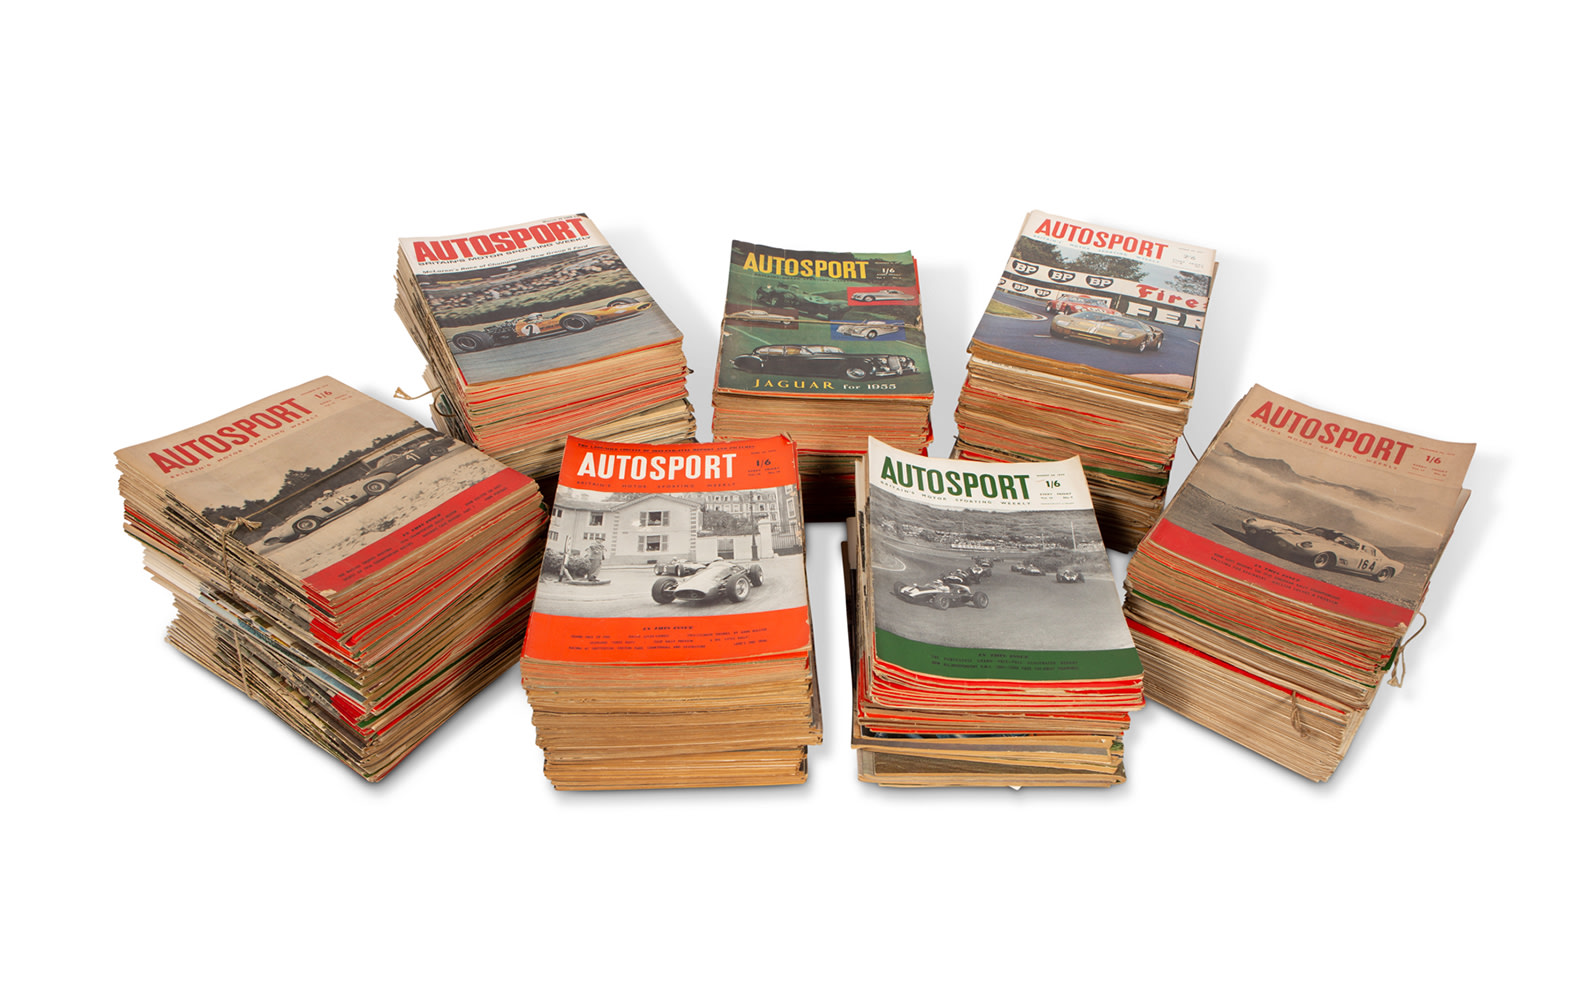 Assorted Autosport Magazines